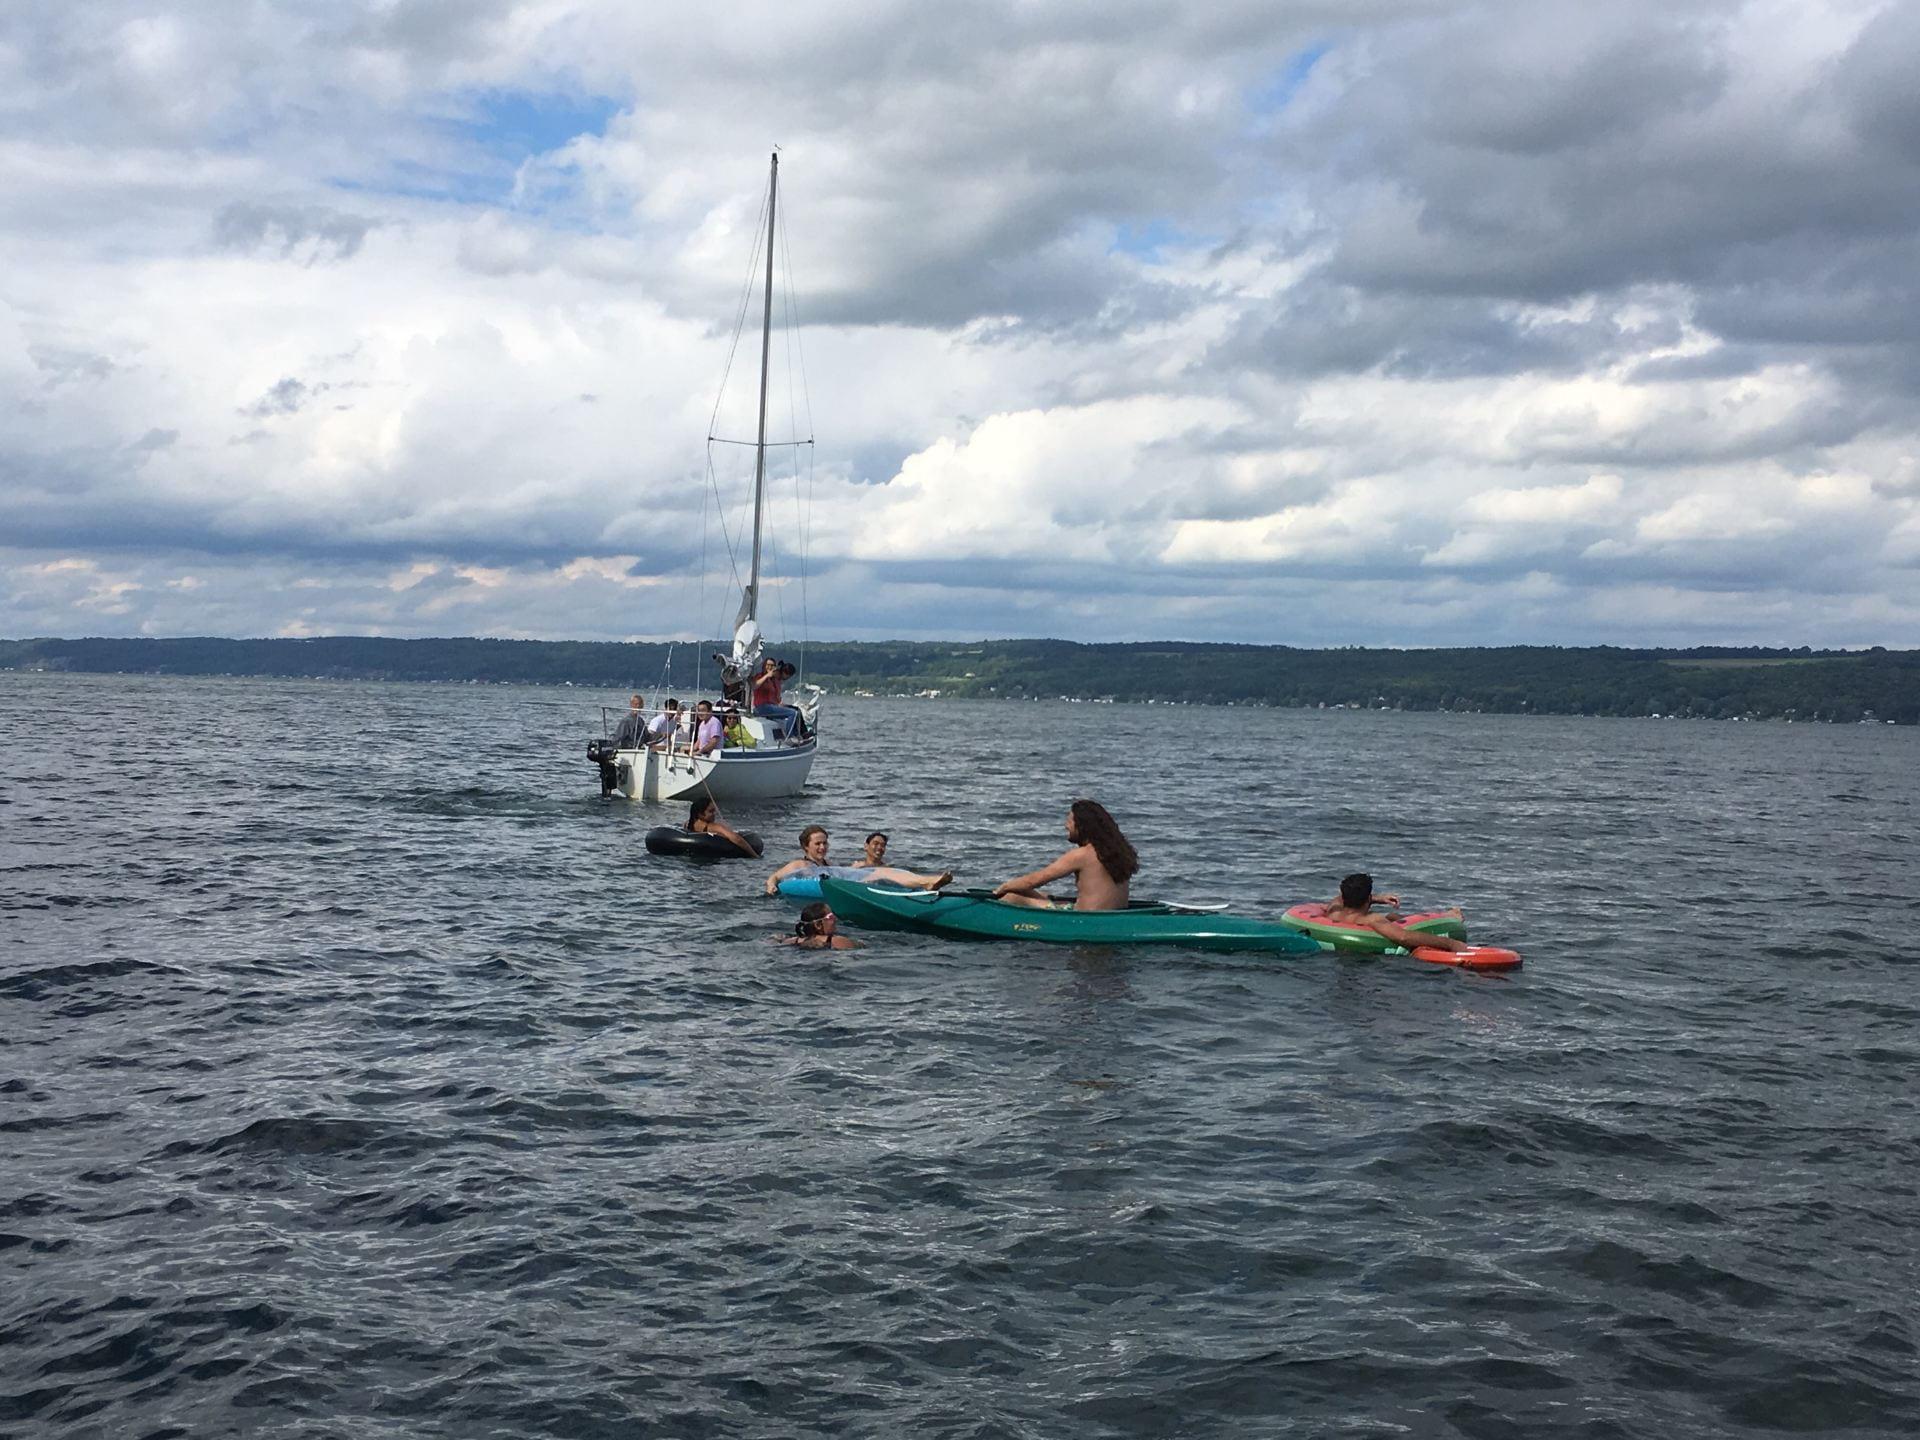 Lab members in Cayuga lake creating a flotilla